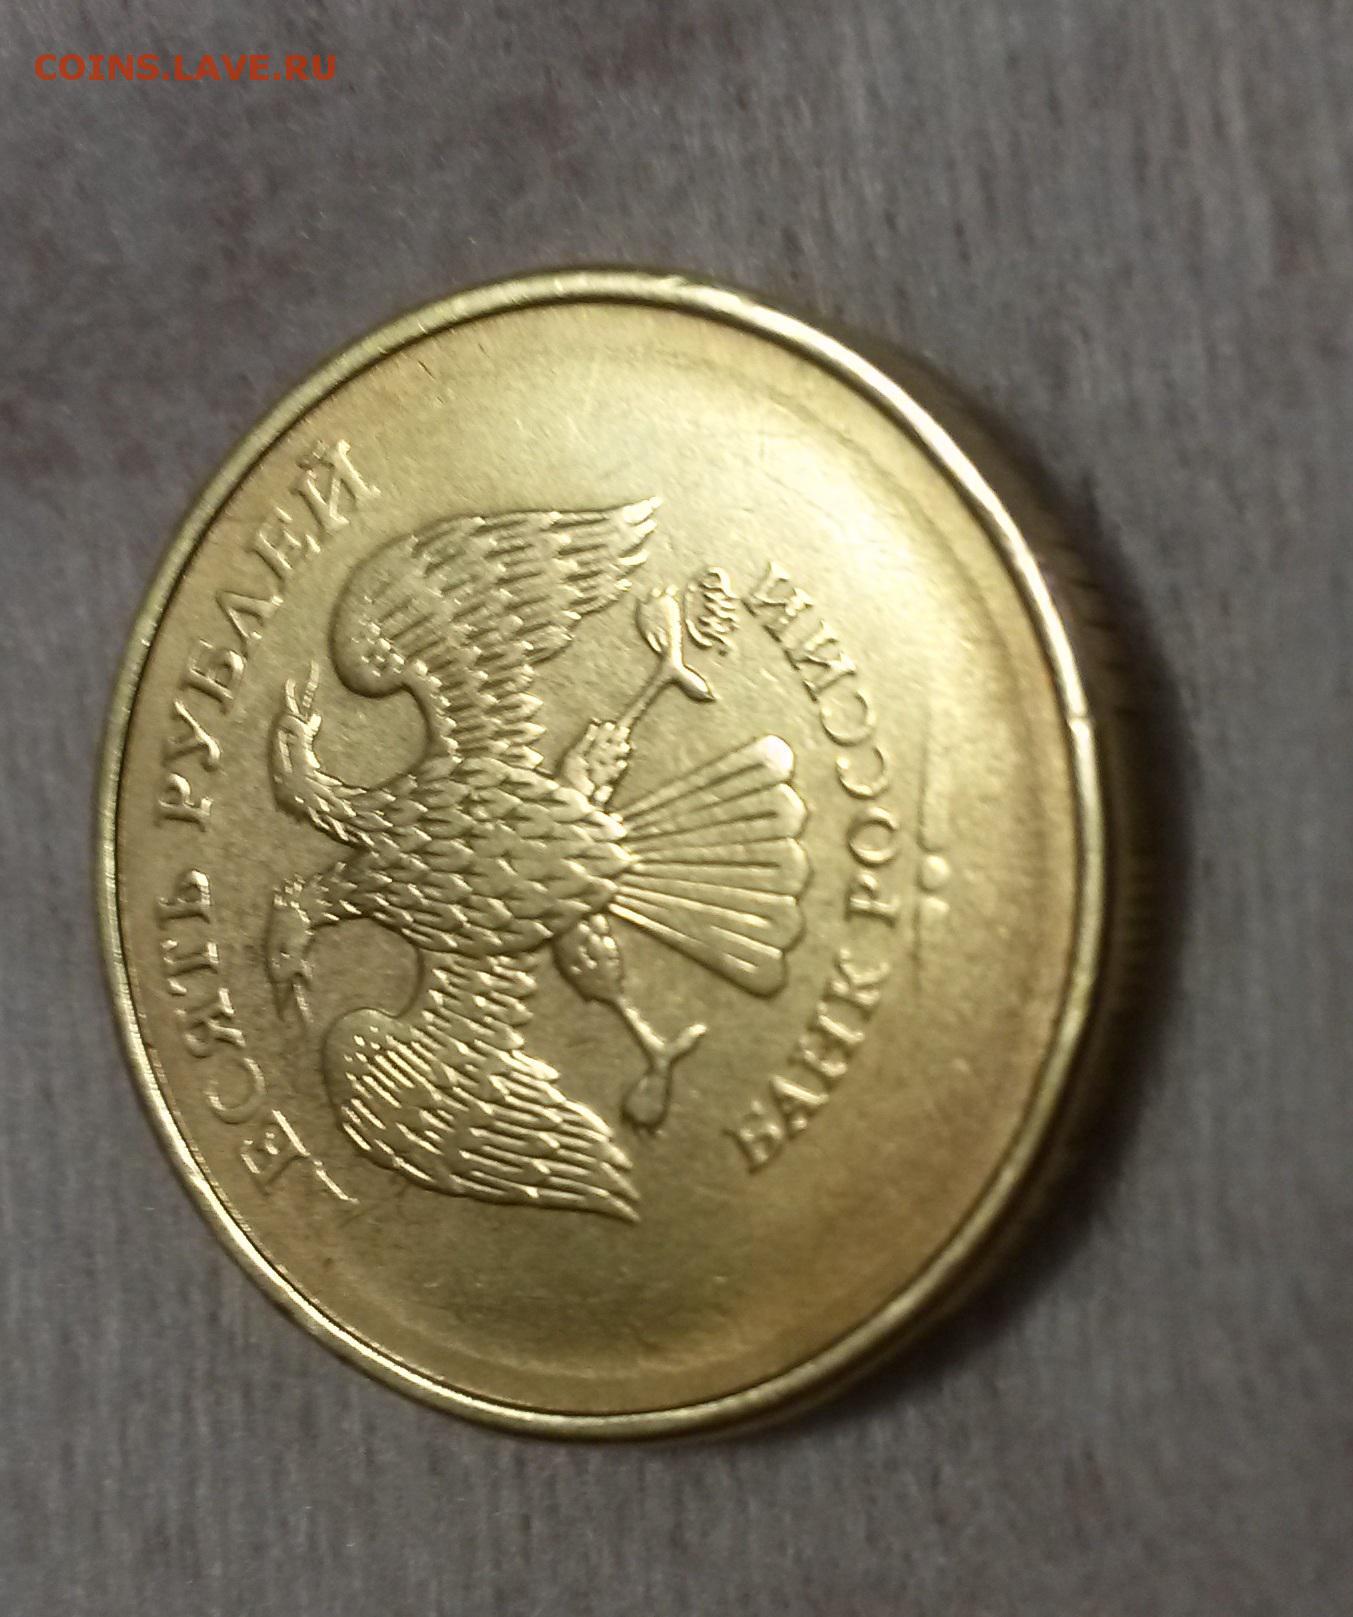 10 рублей без года 1 копейка 1998 разновидности